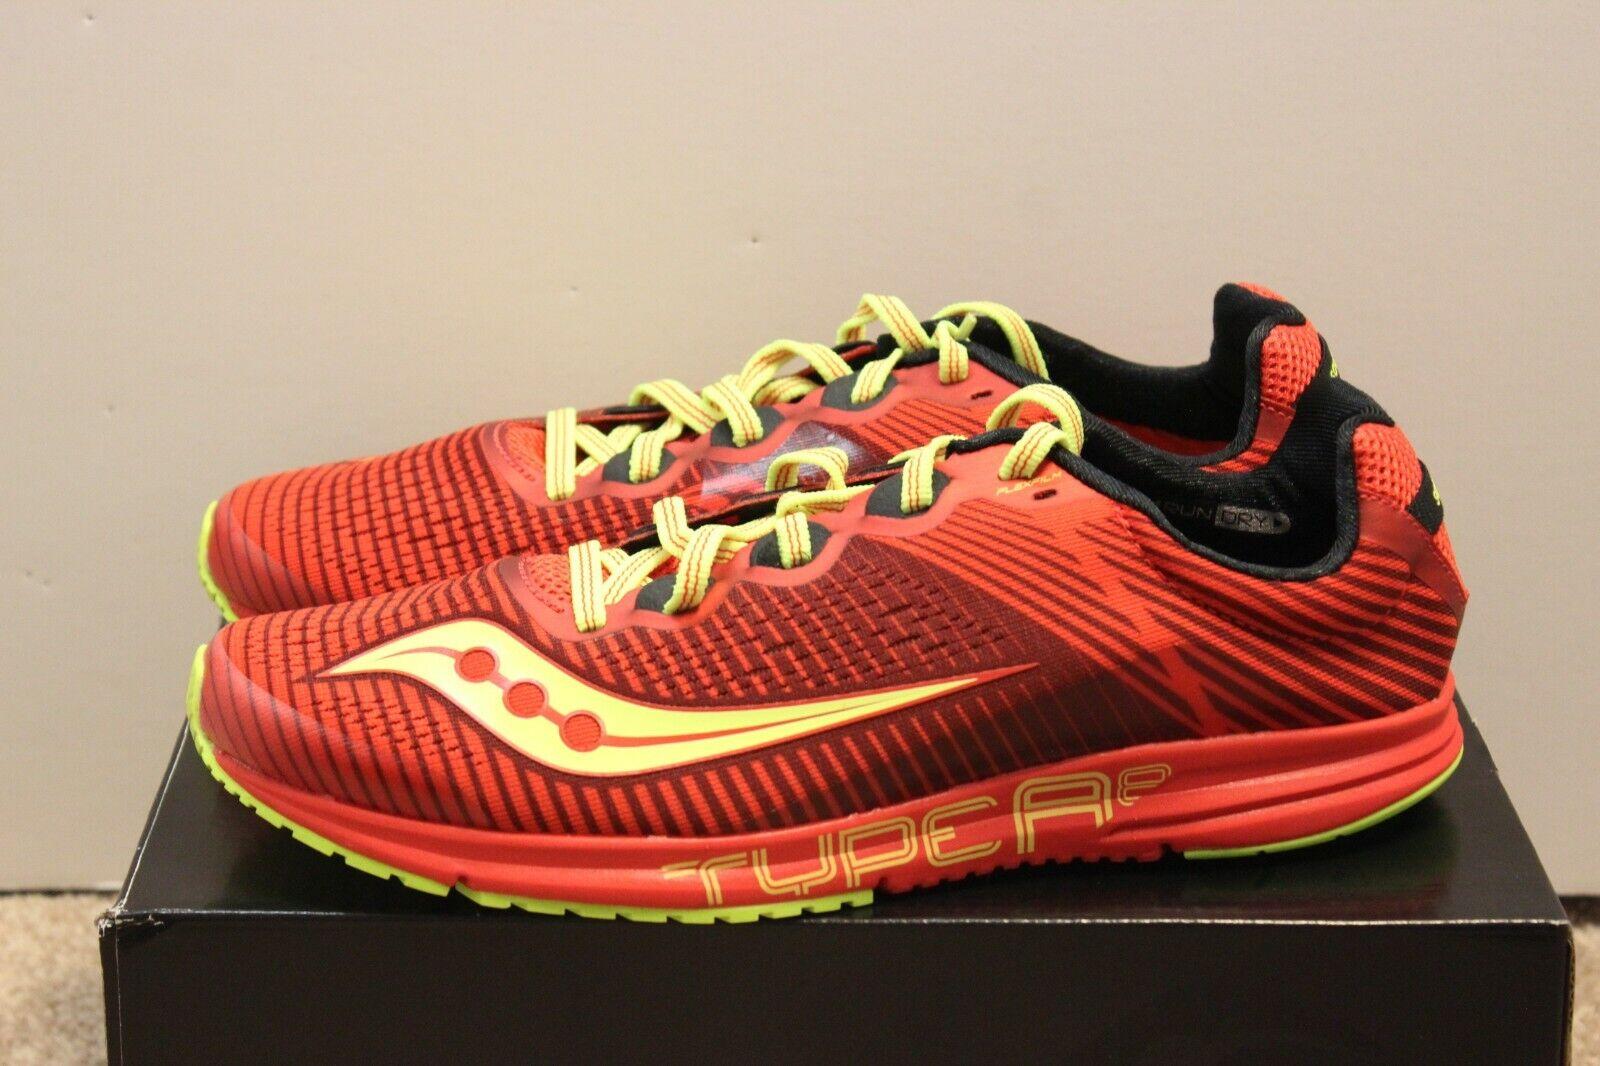 Saucony TYPE A 8 herr Storlek Storlek Storlek 8.5 Springaaande skor skor röd  Citron  grossistaffär